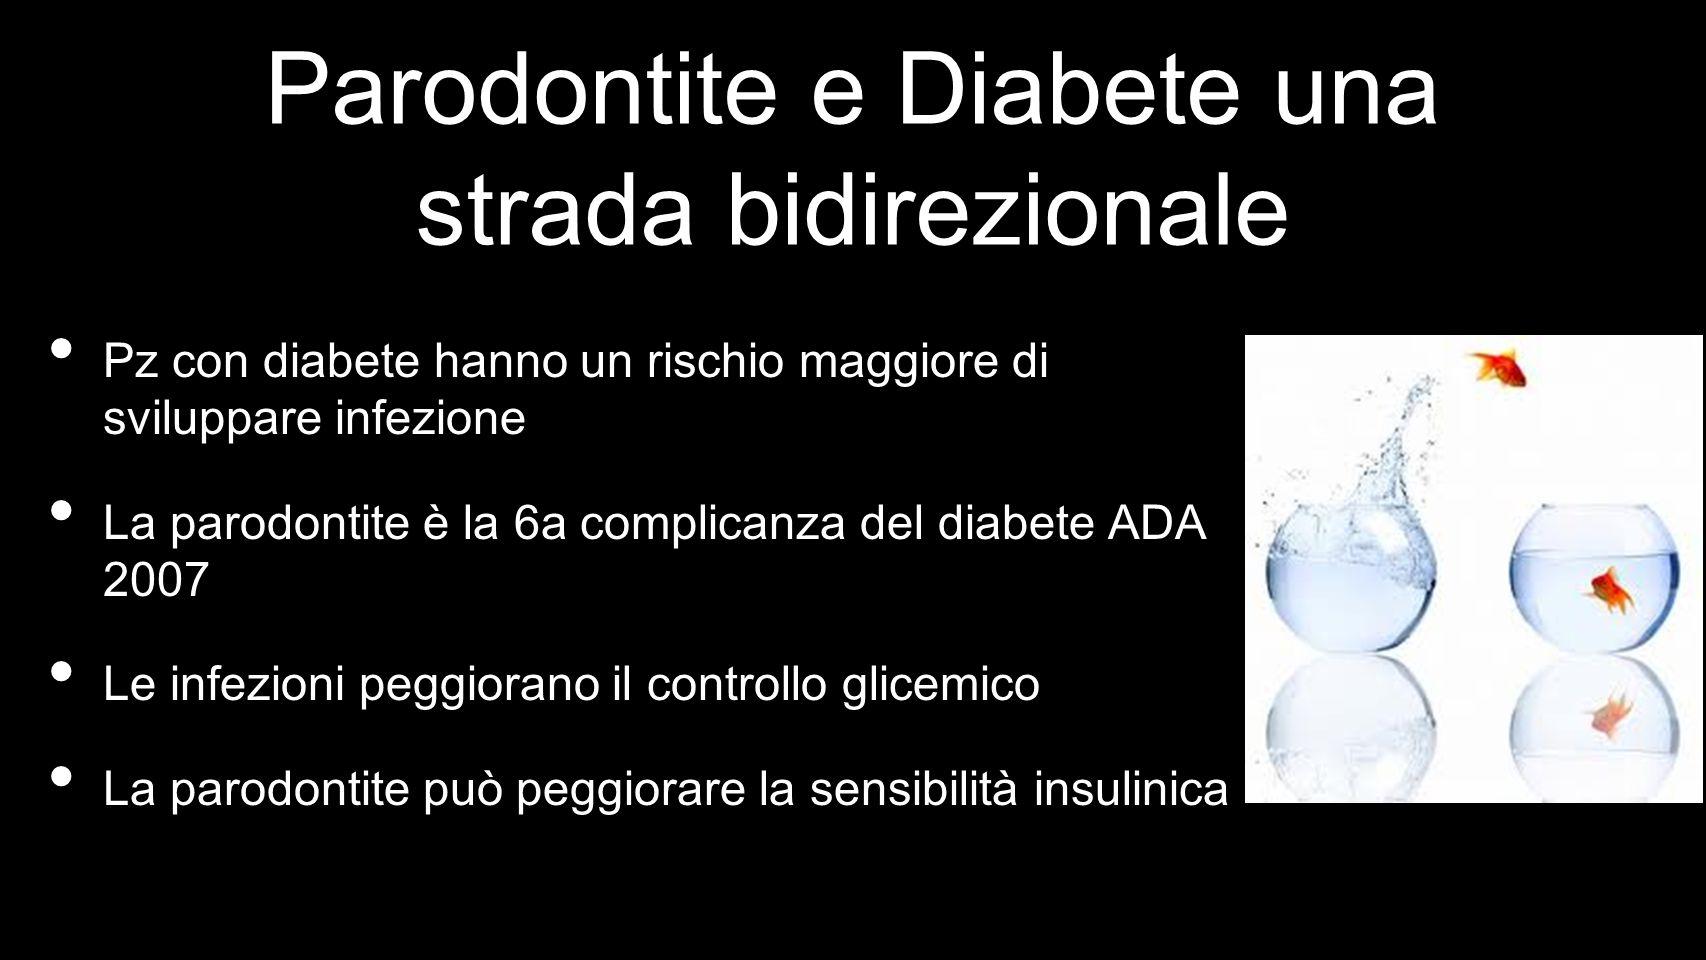 Parodontite e Diabete una strada bidirezionale